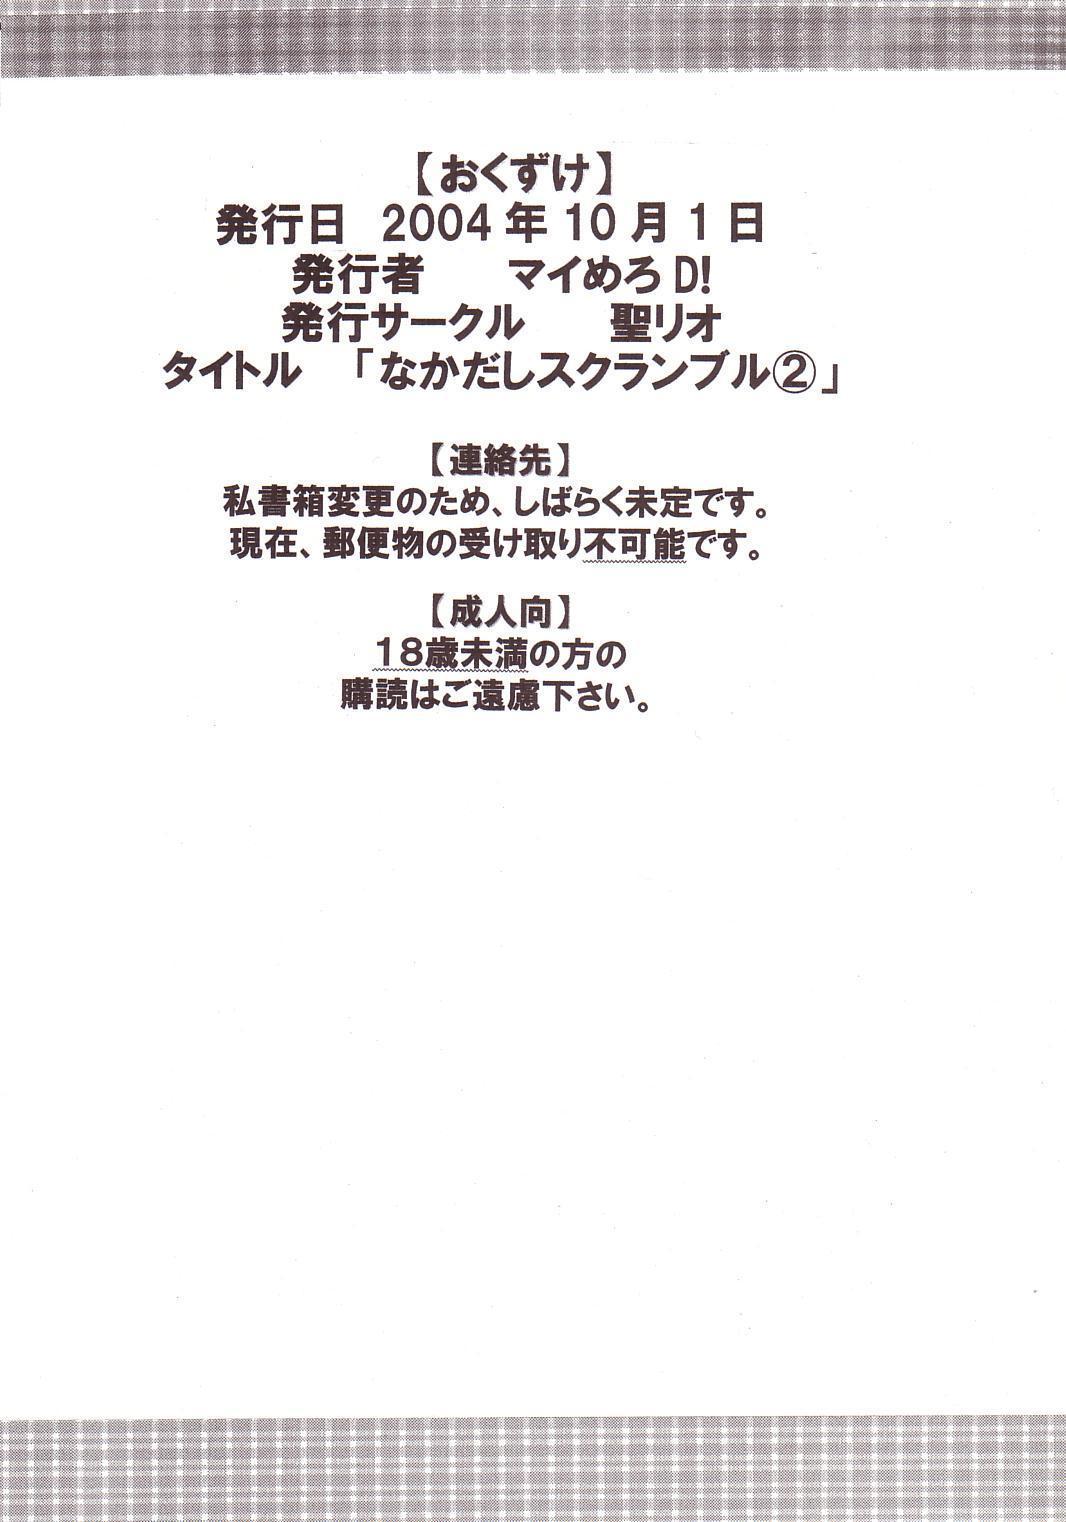 Nakadashi Scramble 2 56